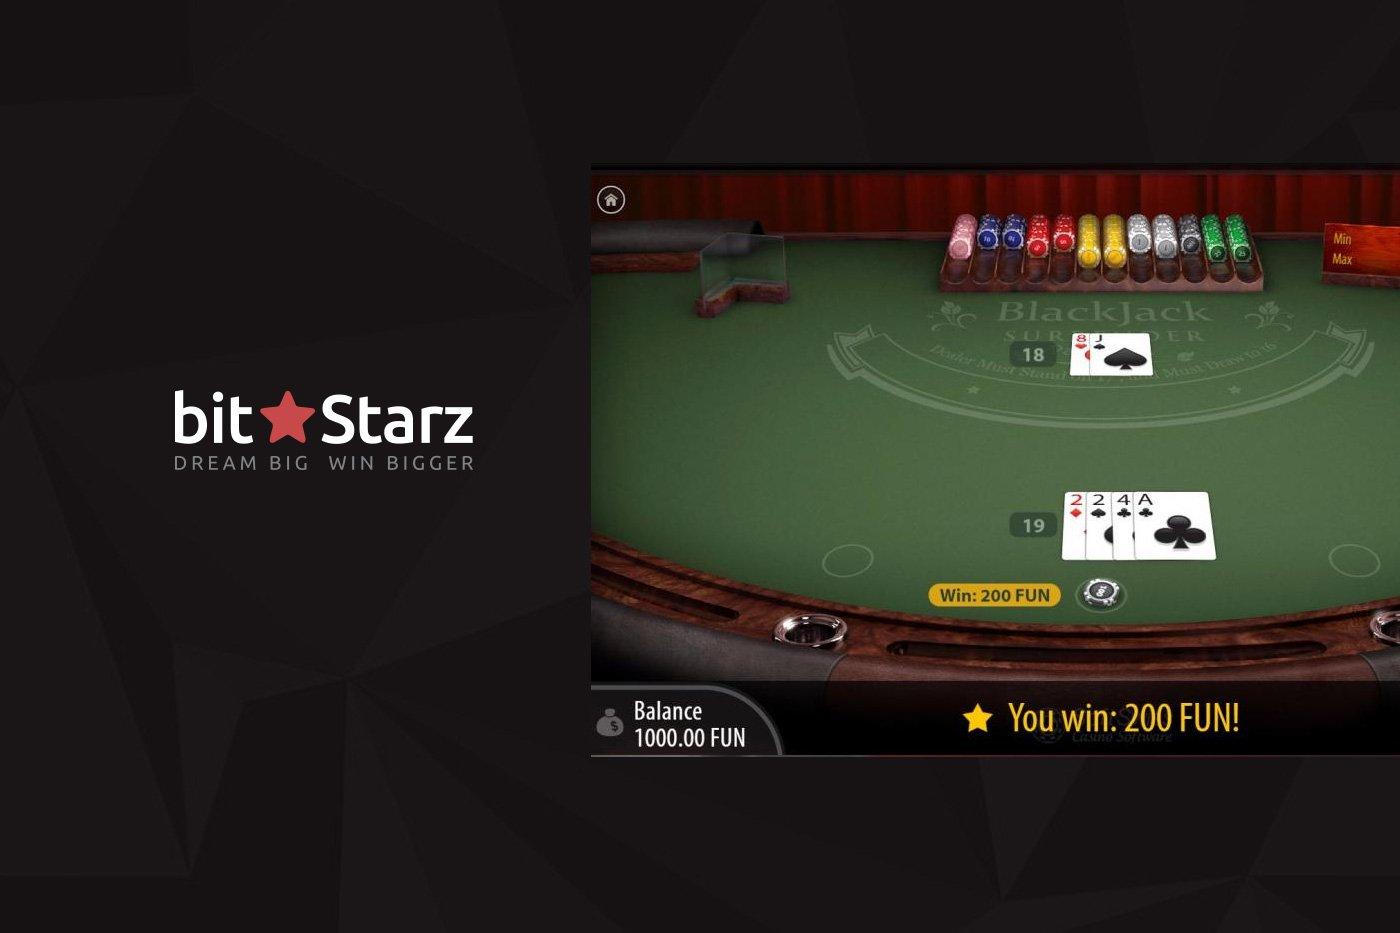 Live dealer games at Bitstarz online casino